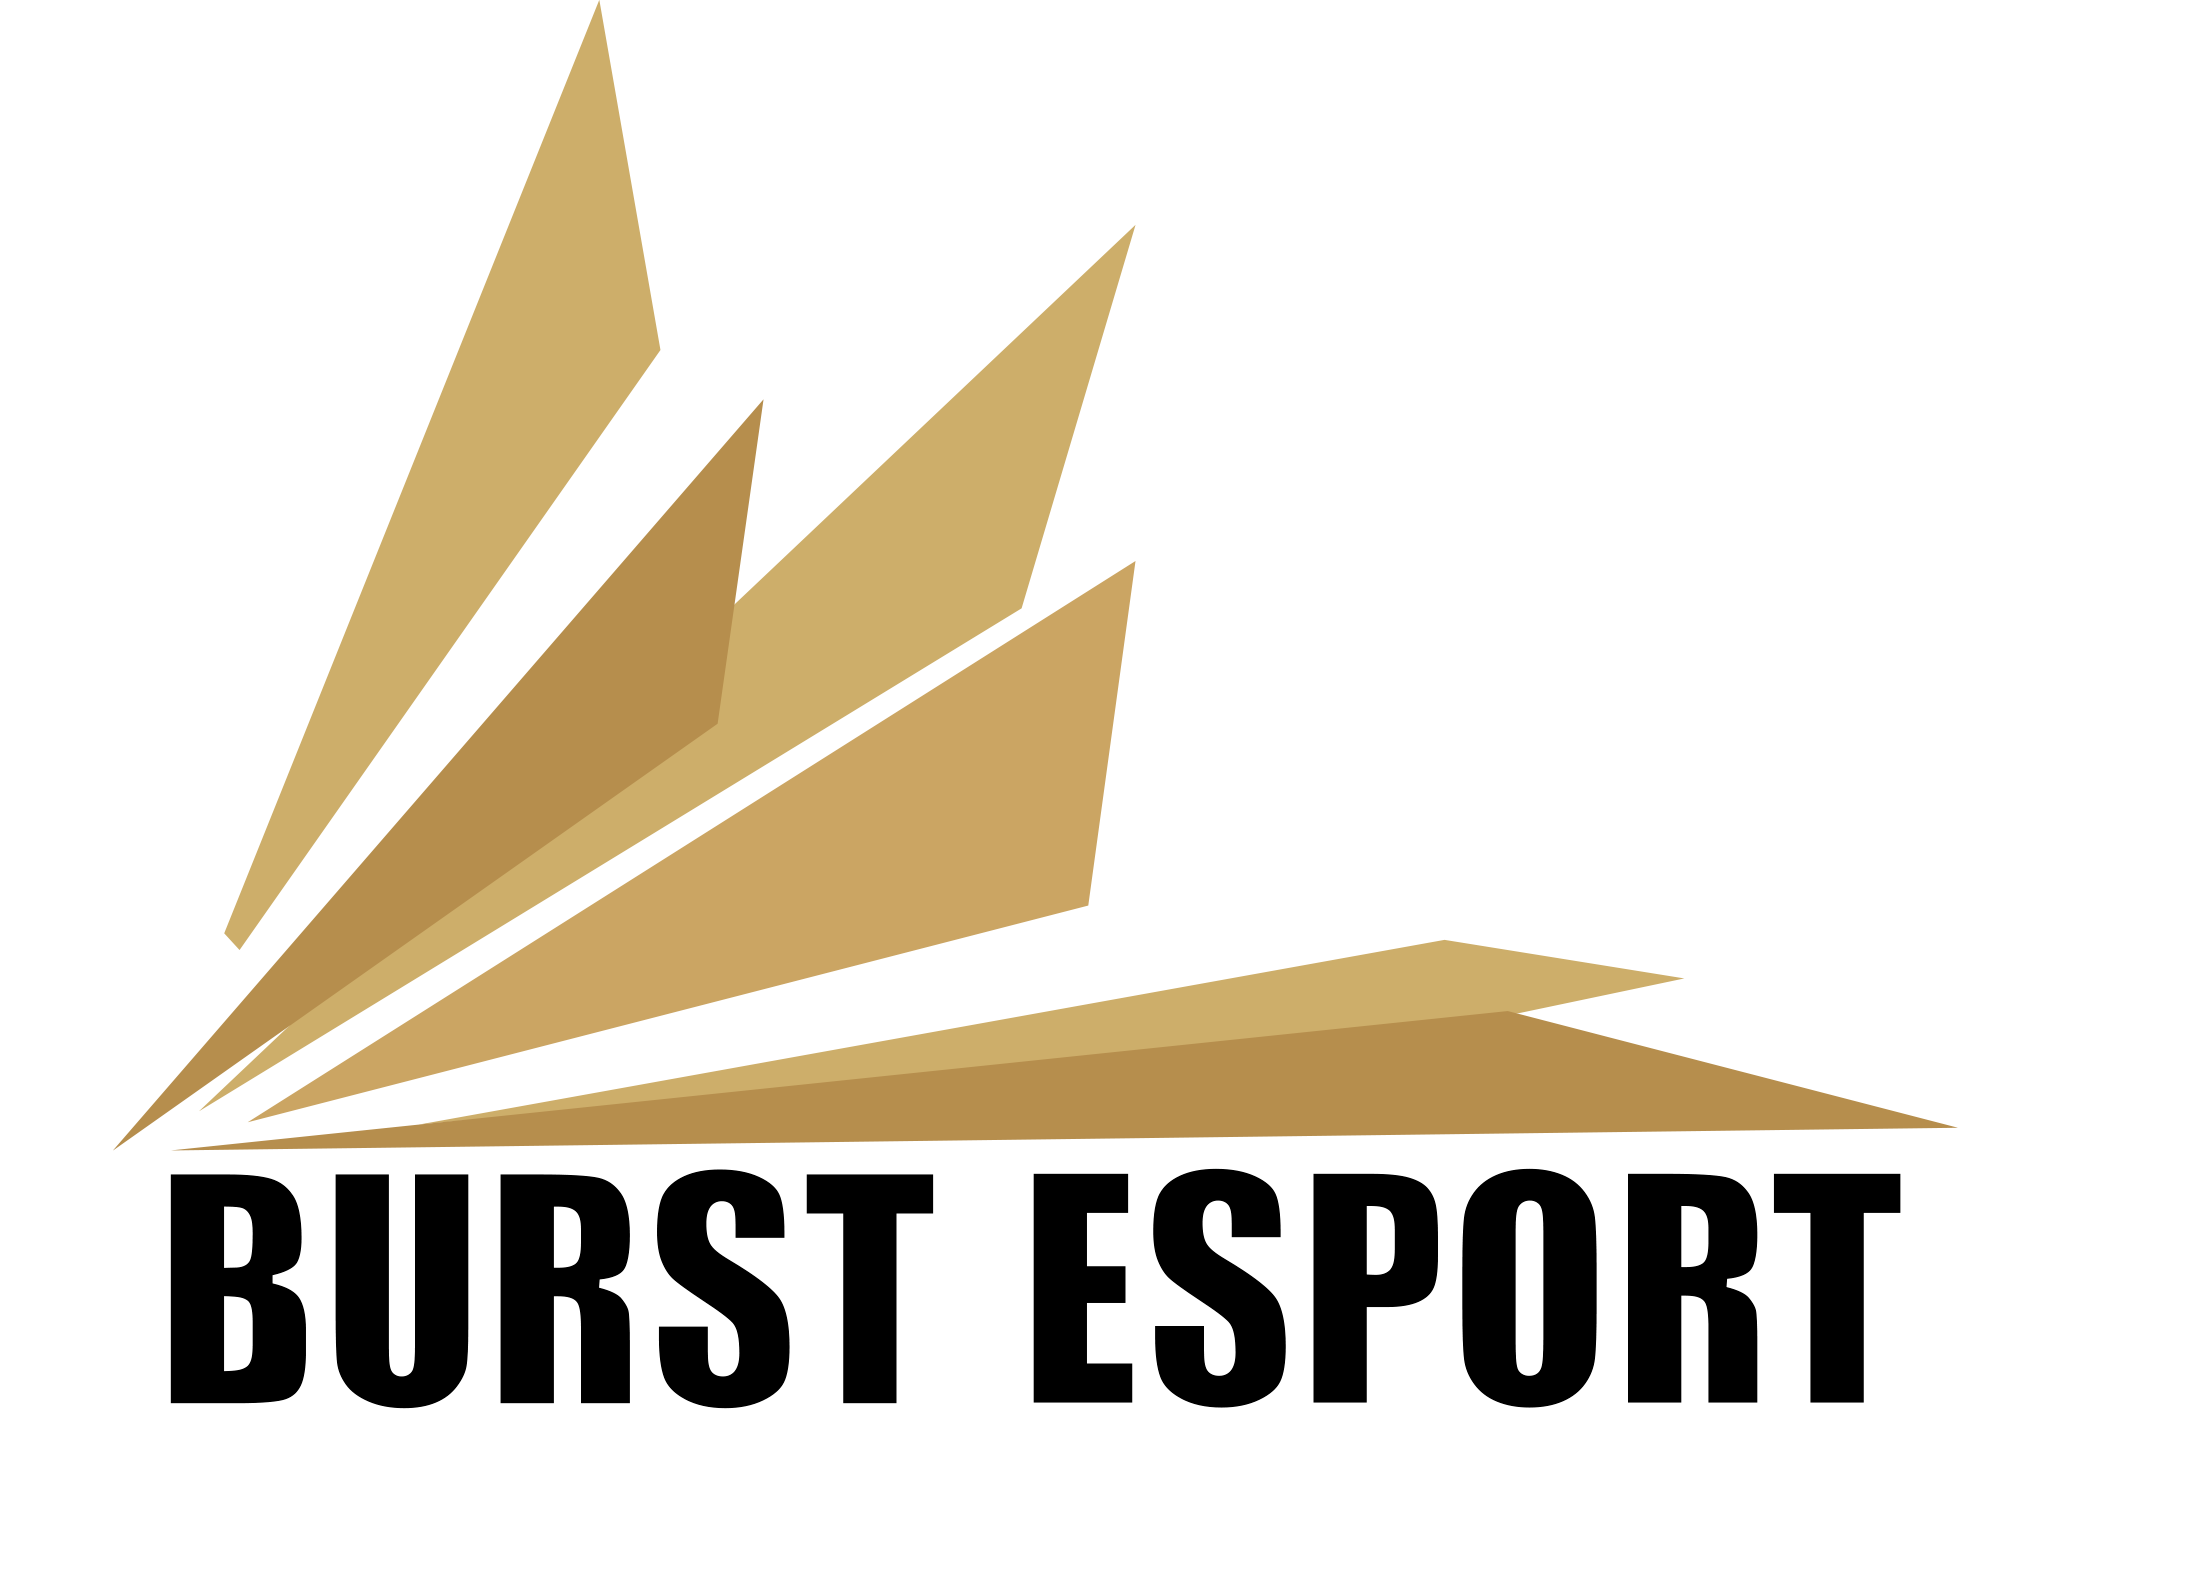 Burst E-Sport